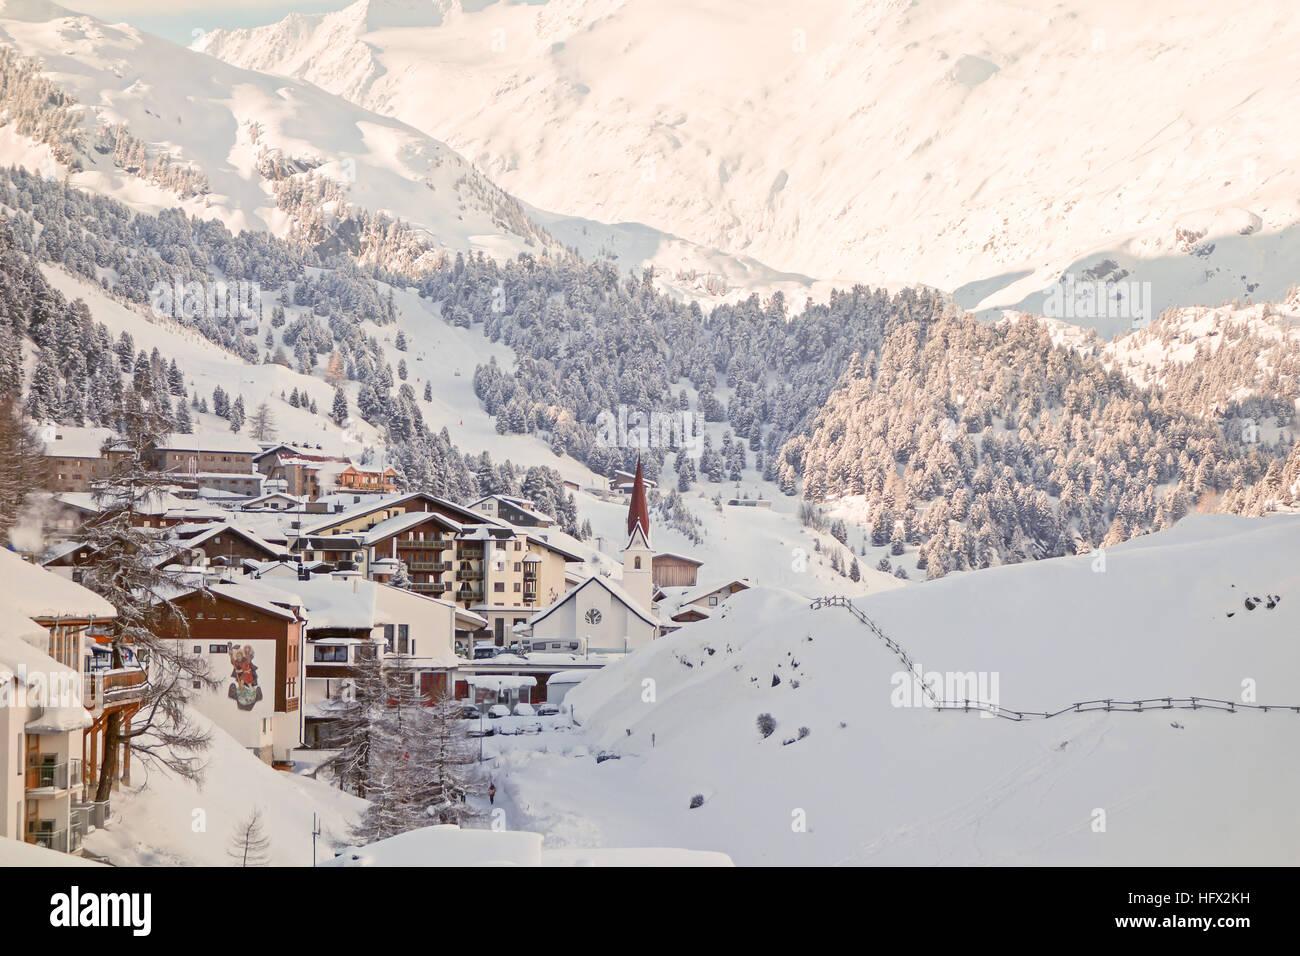 Obergurgl - un austriaco ski resort village Immagini Stock